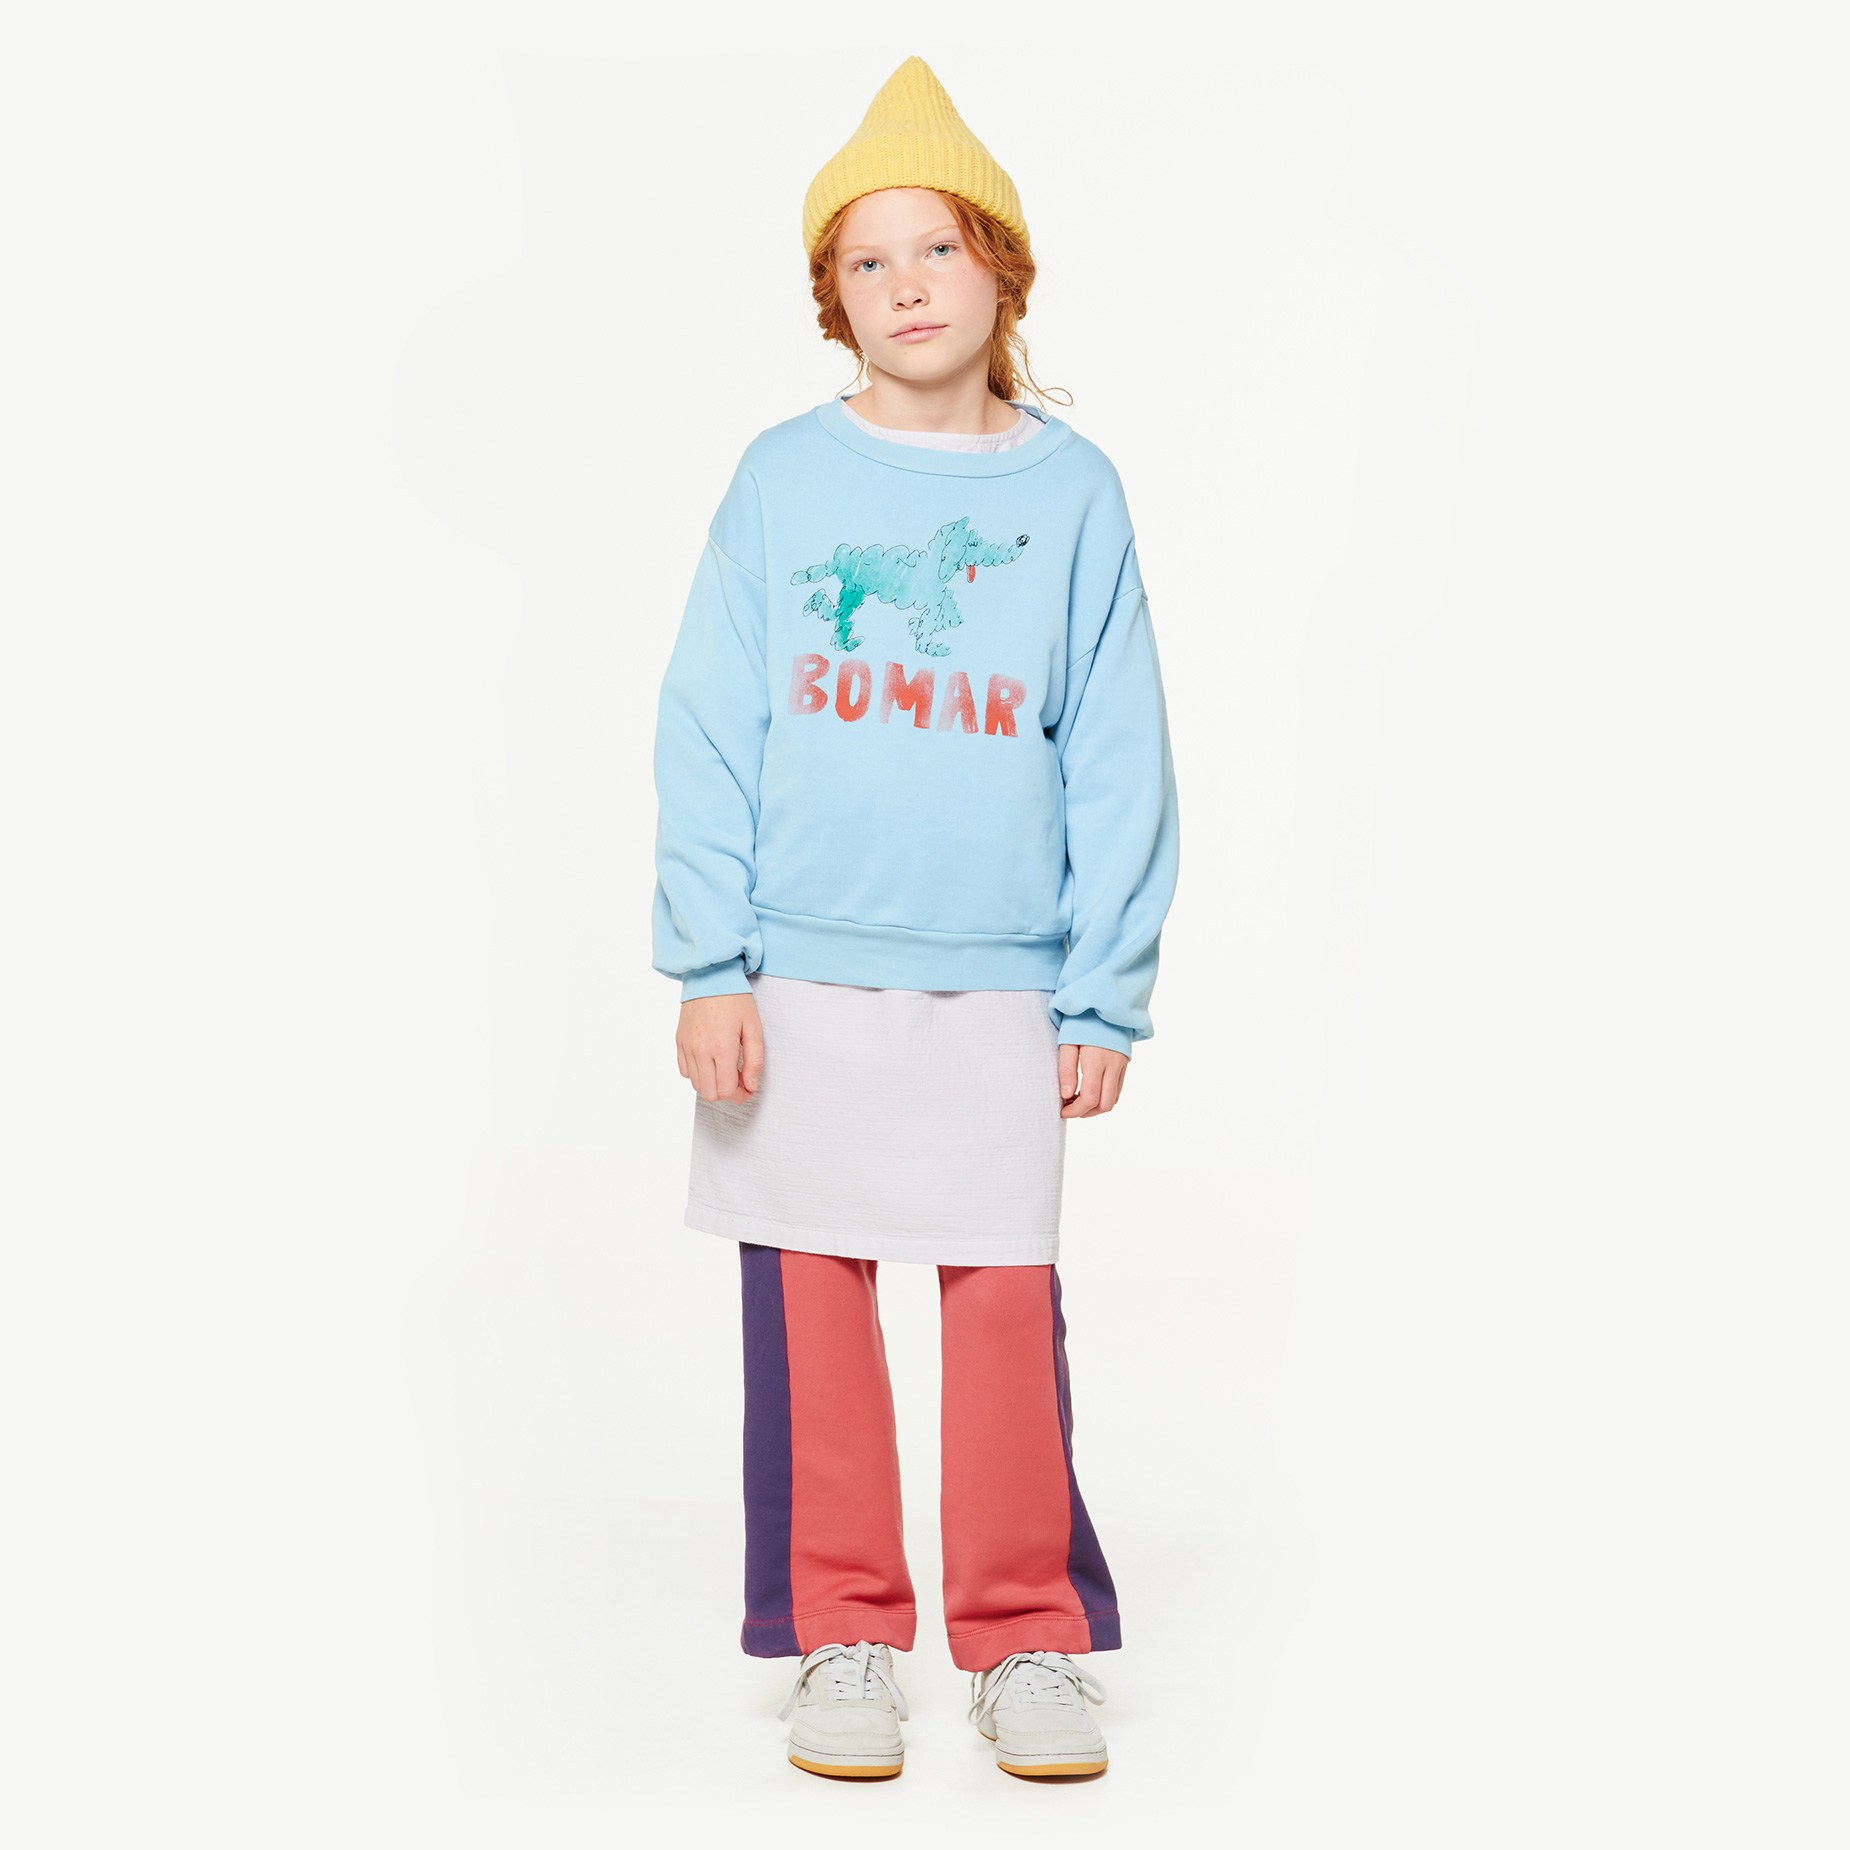 New 2018 Autumn Baby Boy Clothes Kids Tao Brand Poker Sun Stripes Bear  Sweatshirt Girls Tops Children T shirt Bobo Choses-in T-Shirts from Mother    Kids on ... 25b7cfcd653c